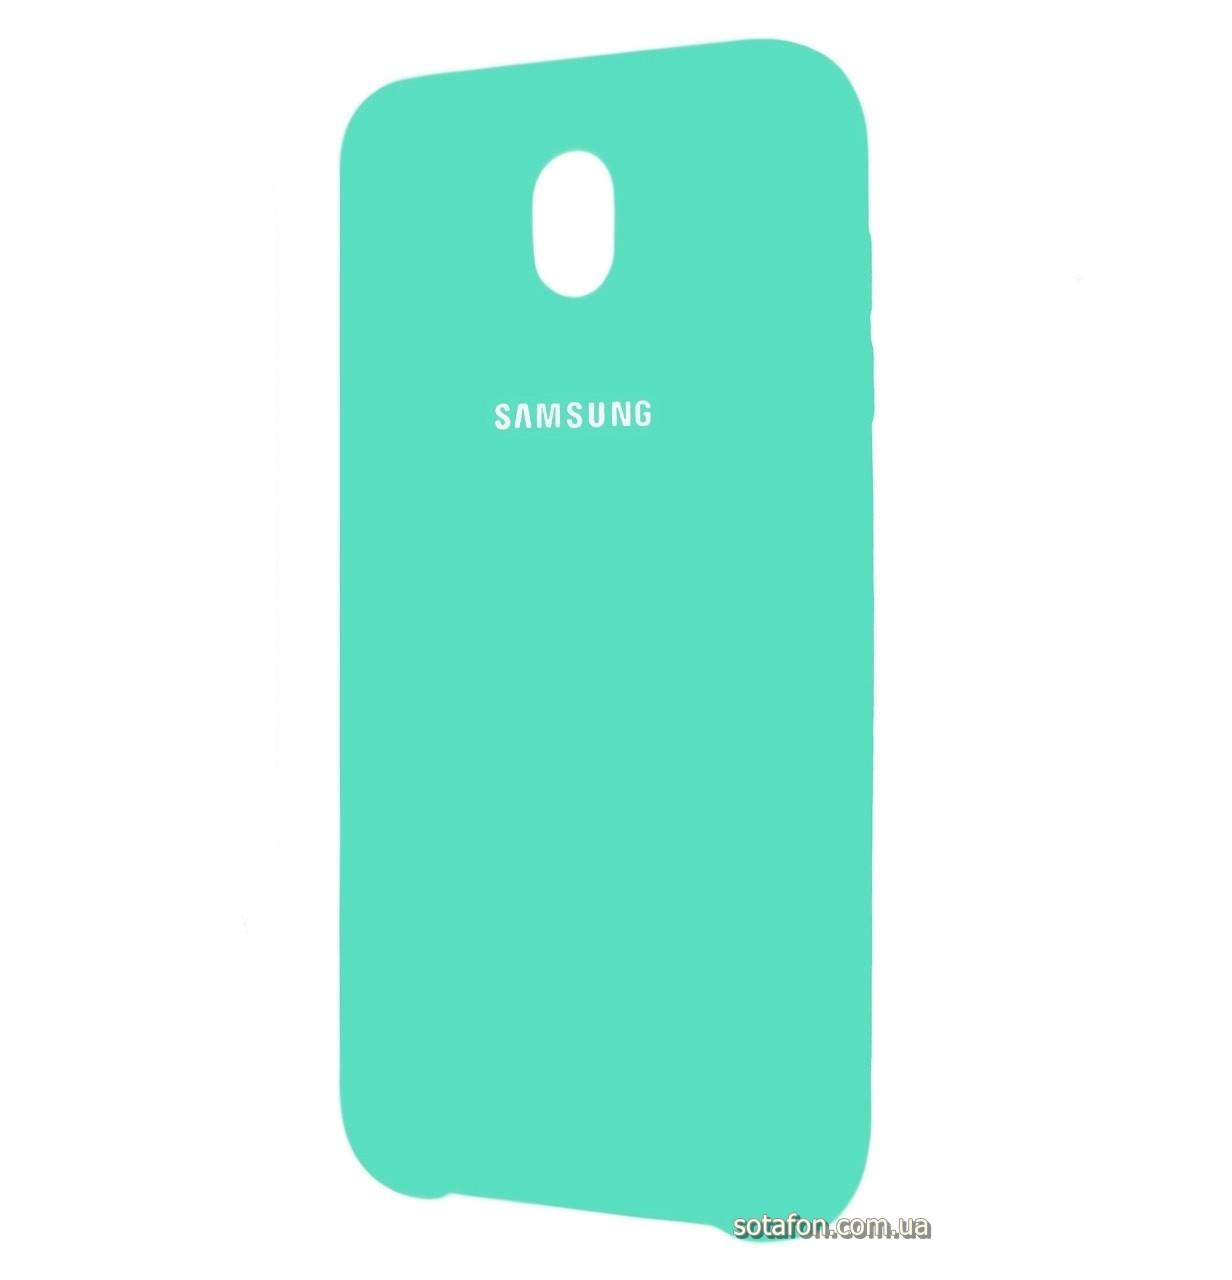 Чехол-накладка Original Silicone case на Samsung Galaxy J7 (2017) SM-J730F Mint